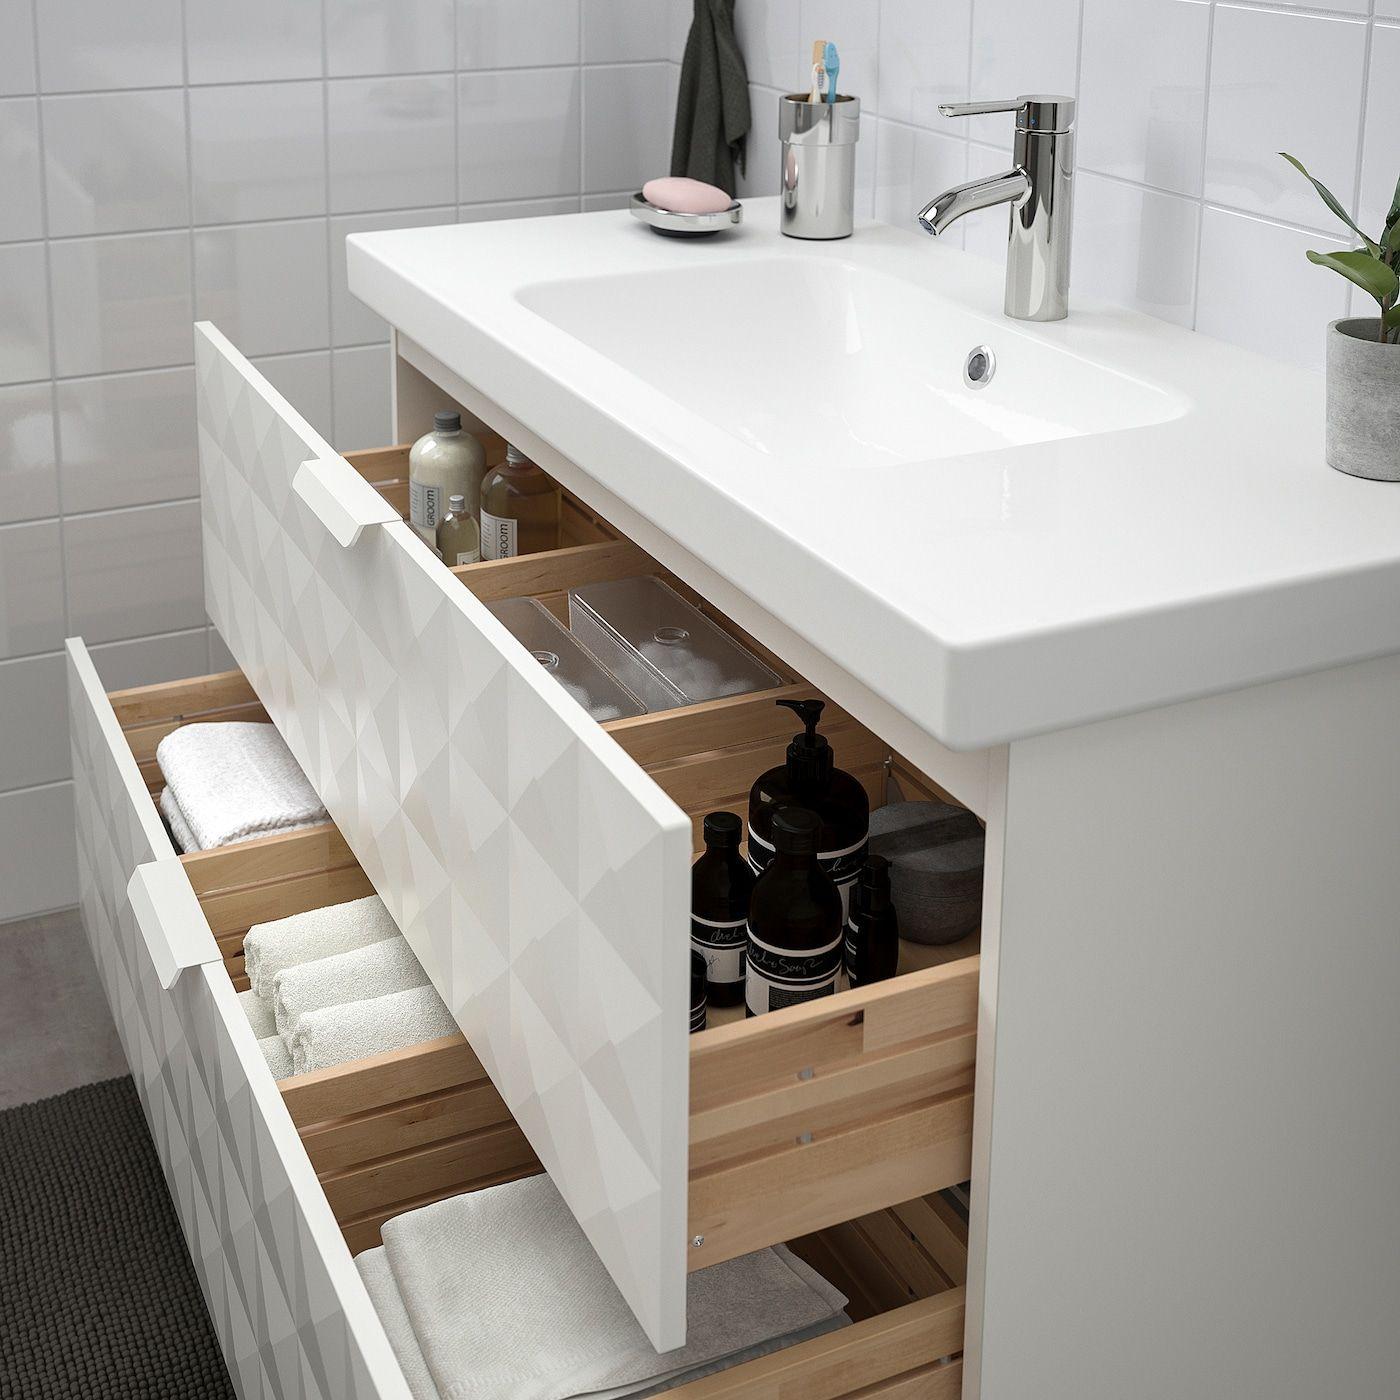 Ikea Godmorgon Odensvik Resjon White Dalskar Faucet Sink Cabinet With 2 Drawers In 2020 Diy Bathroom Design Diy Bathroom Inspiration Diy Bathroom